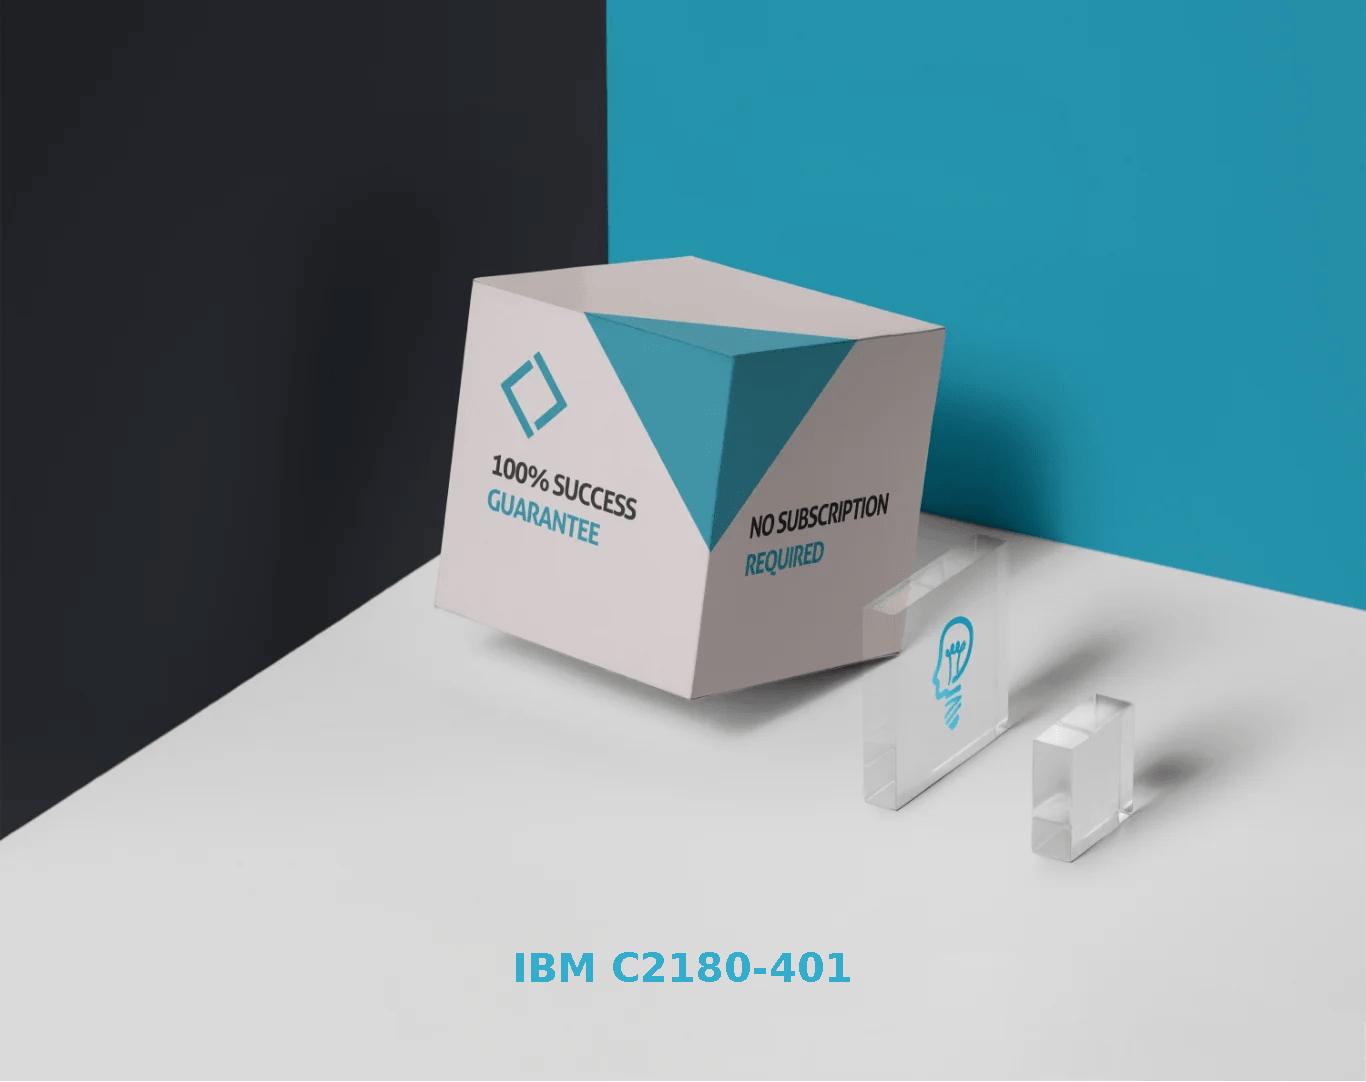 IBM C2180-401 Exams